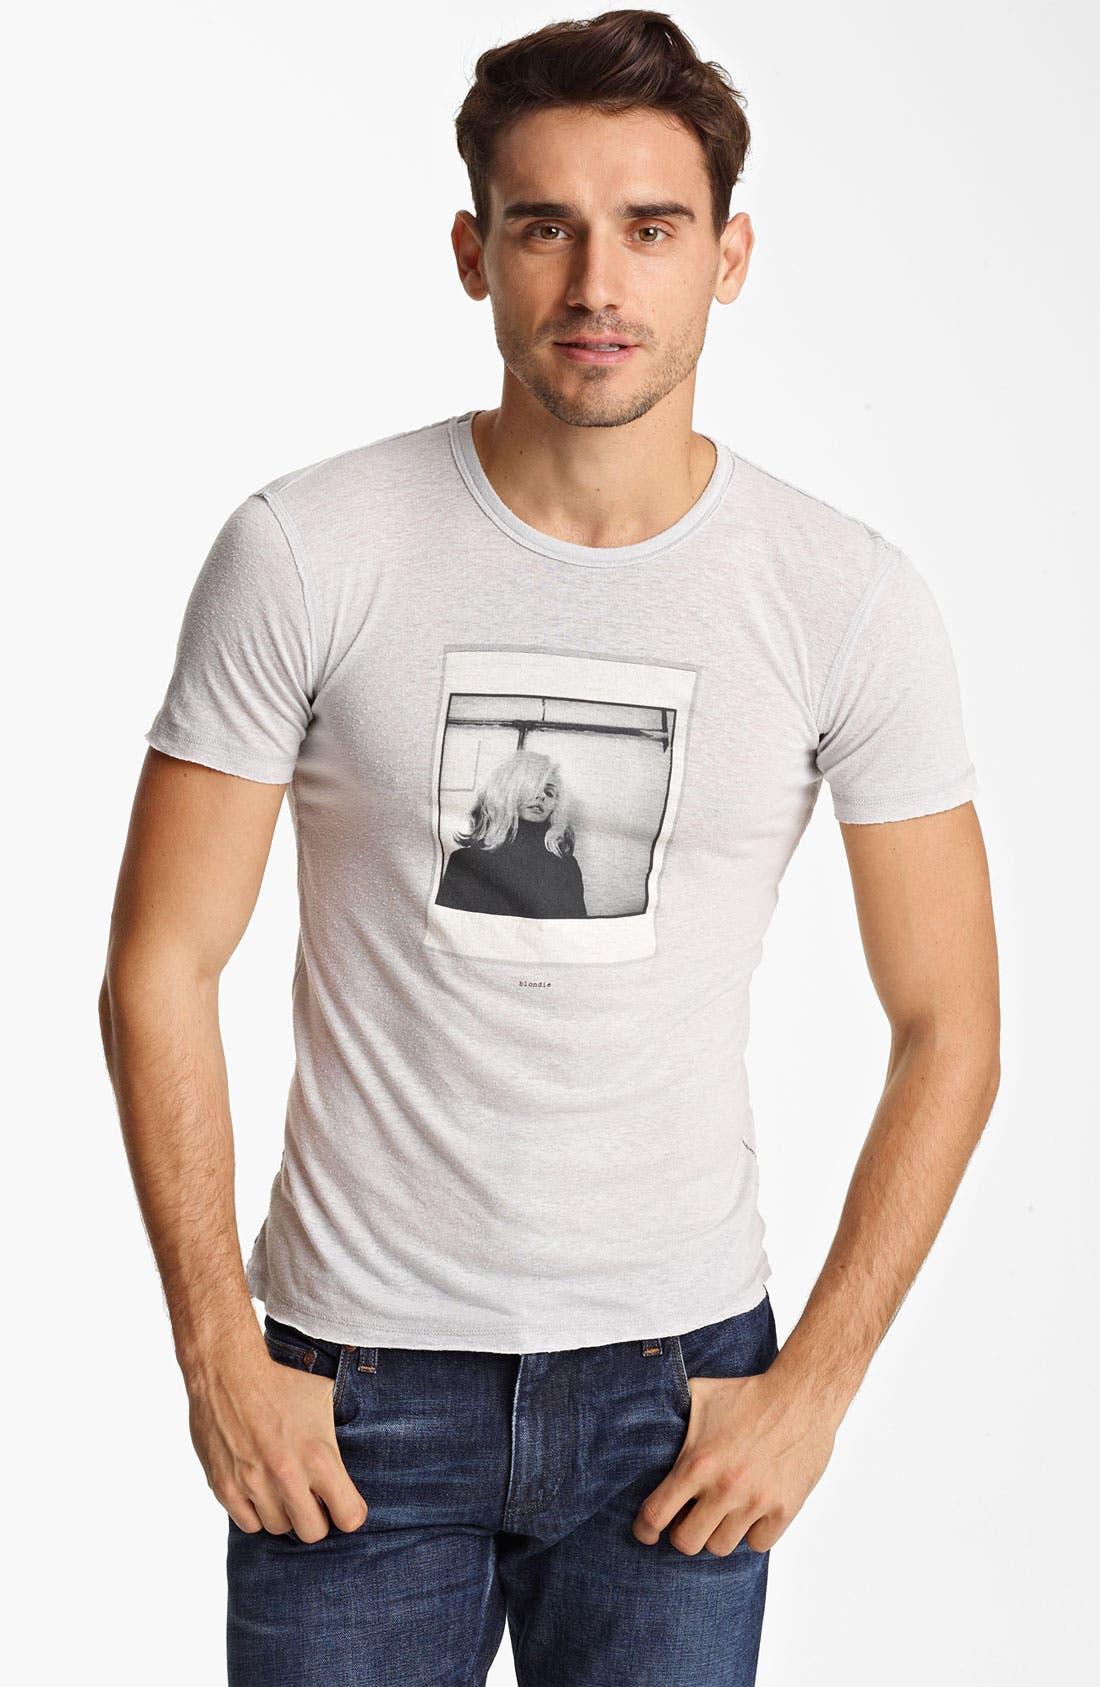 Main Image - Dolce&Gabbana 'Blondie' Print T-Shirt